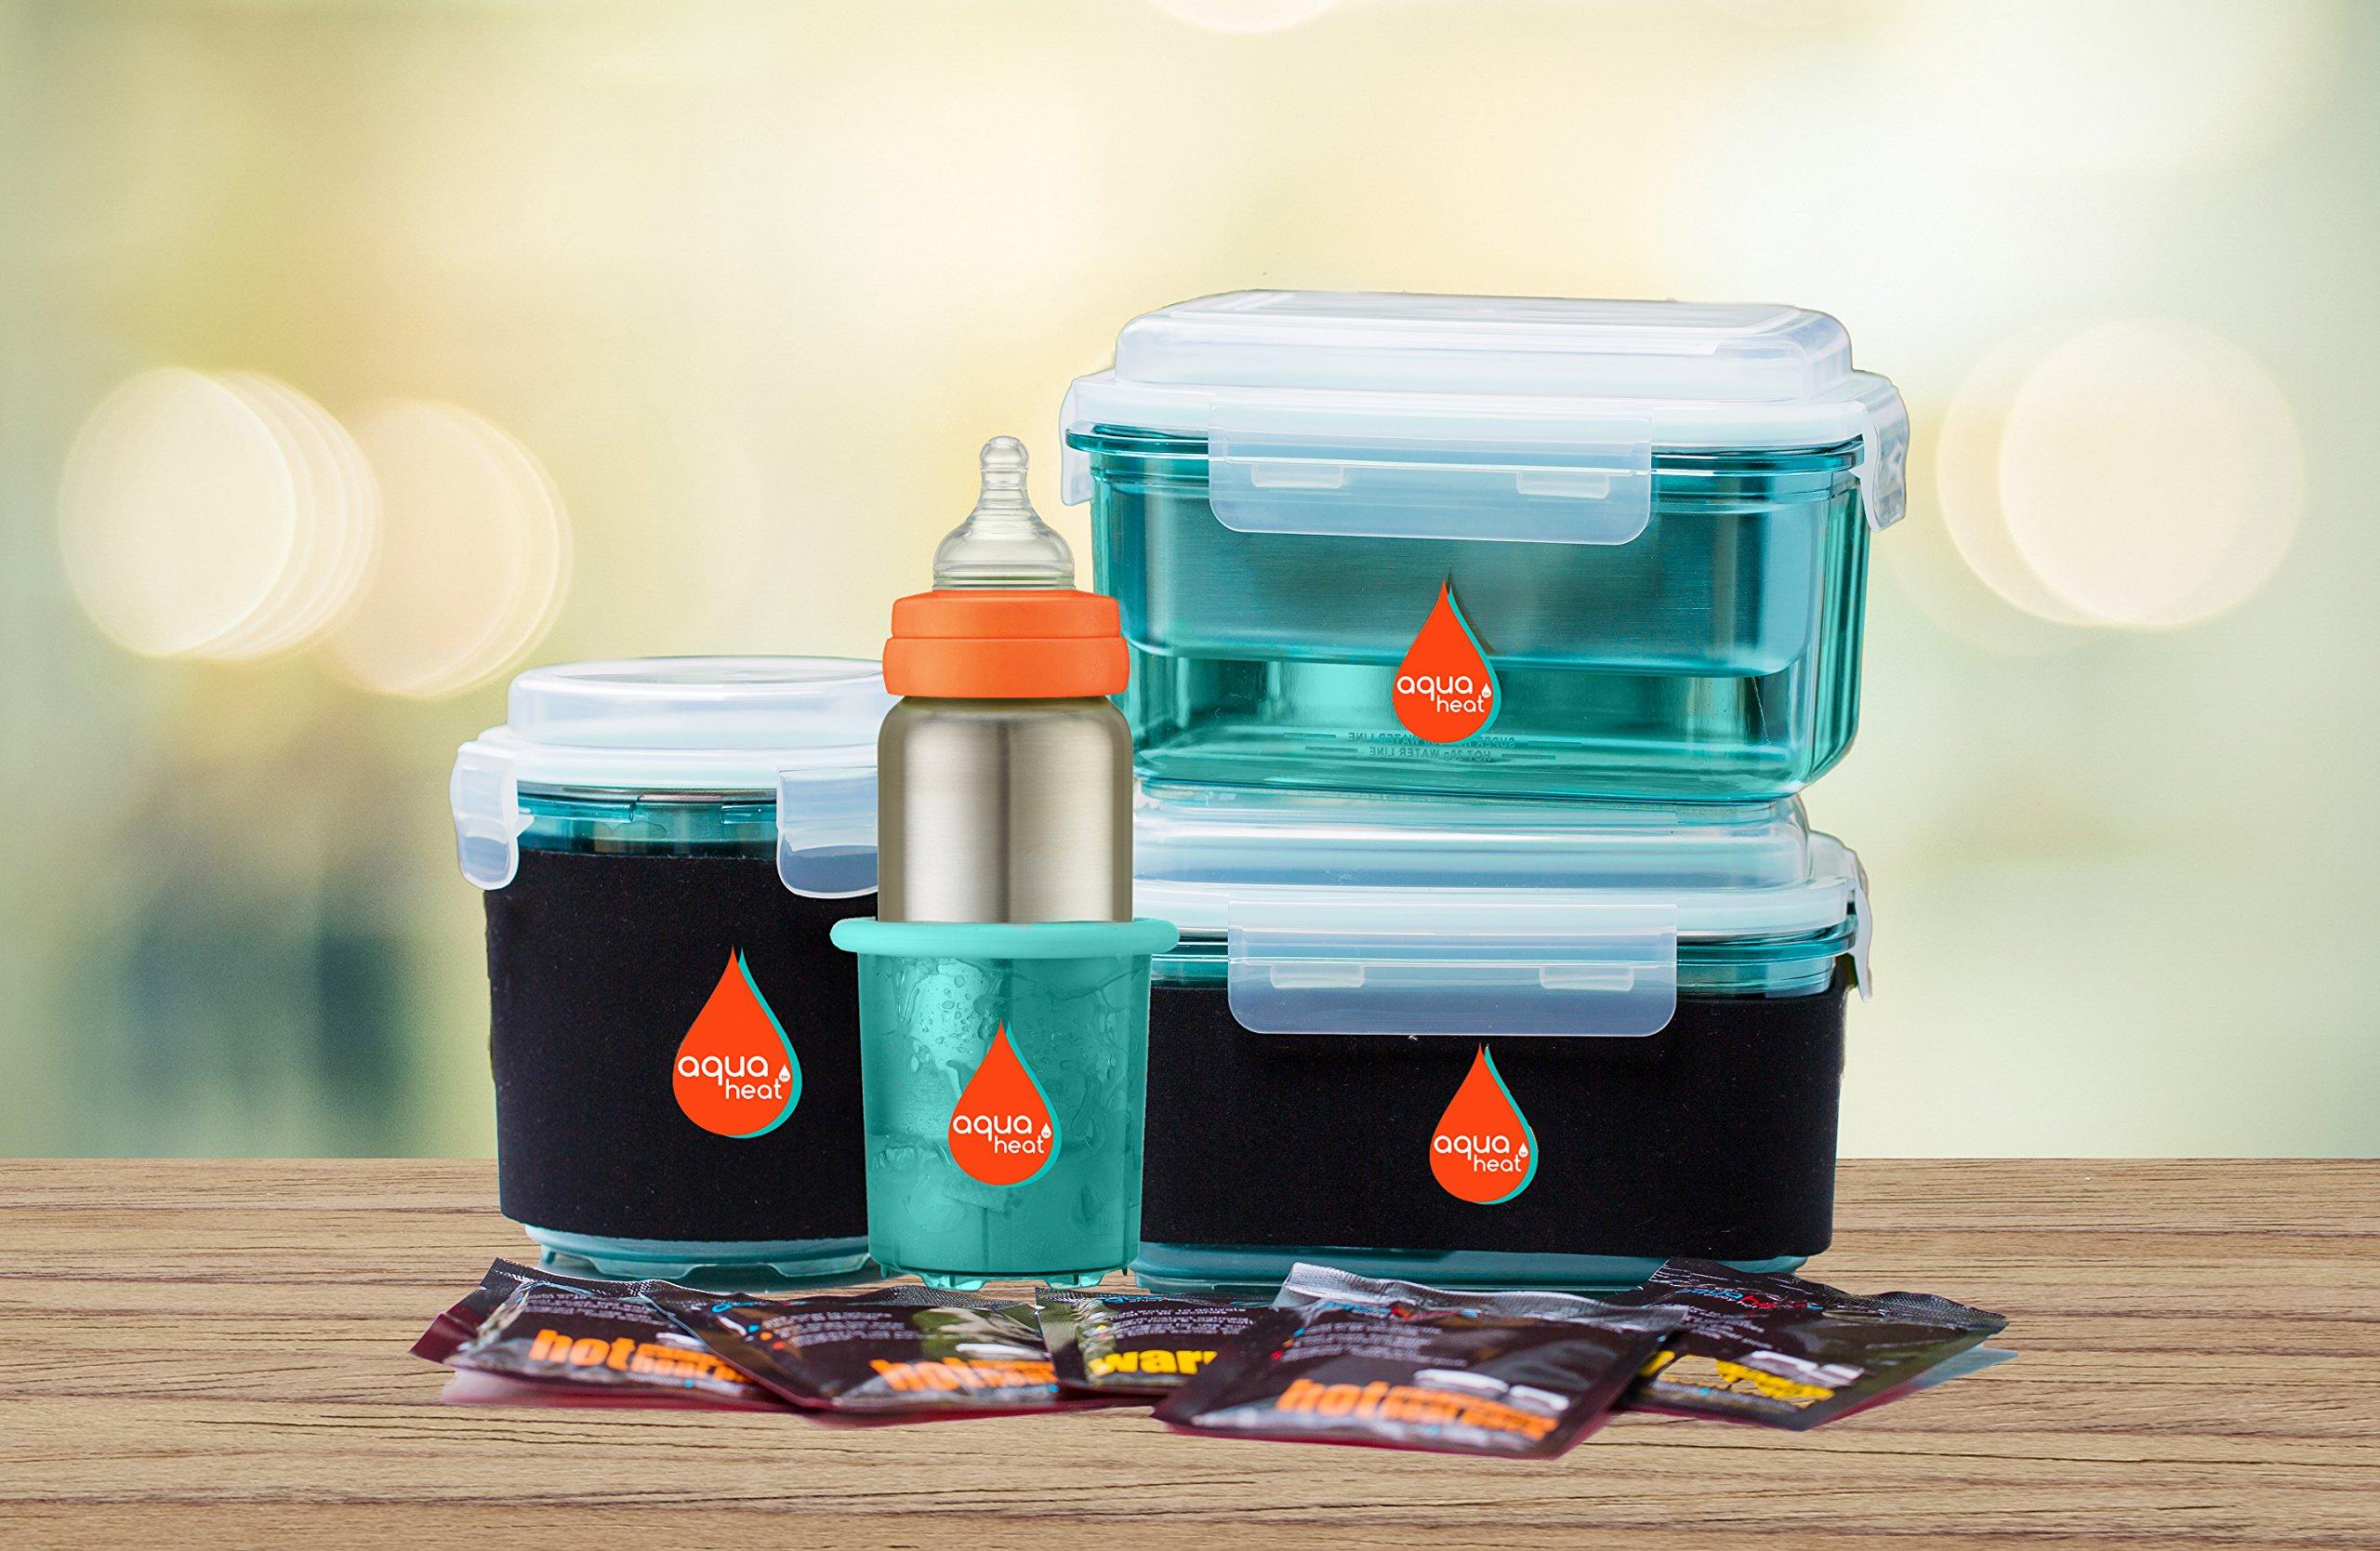 Innobaby Aquaheat Stainless Steel Baby Bottle and Travel Bottle Warmer Set. BPA Free.